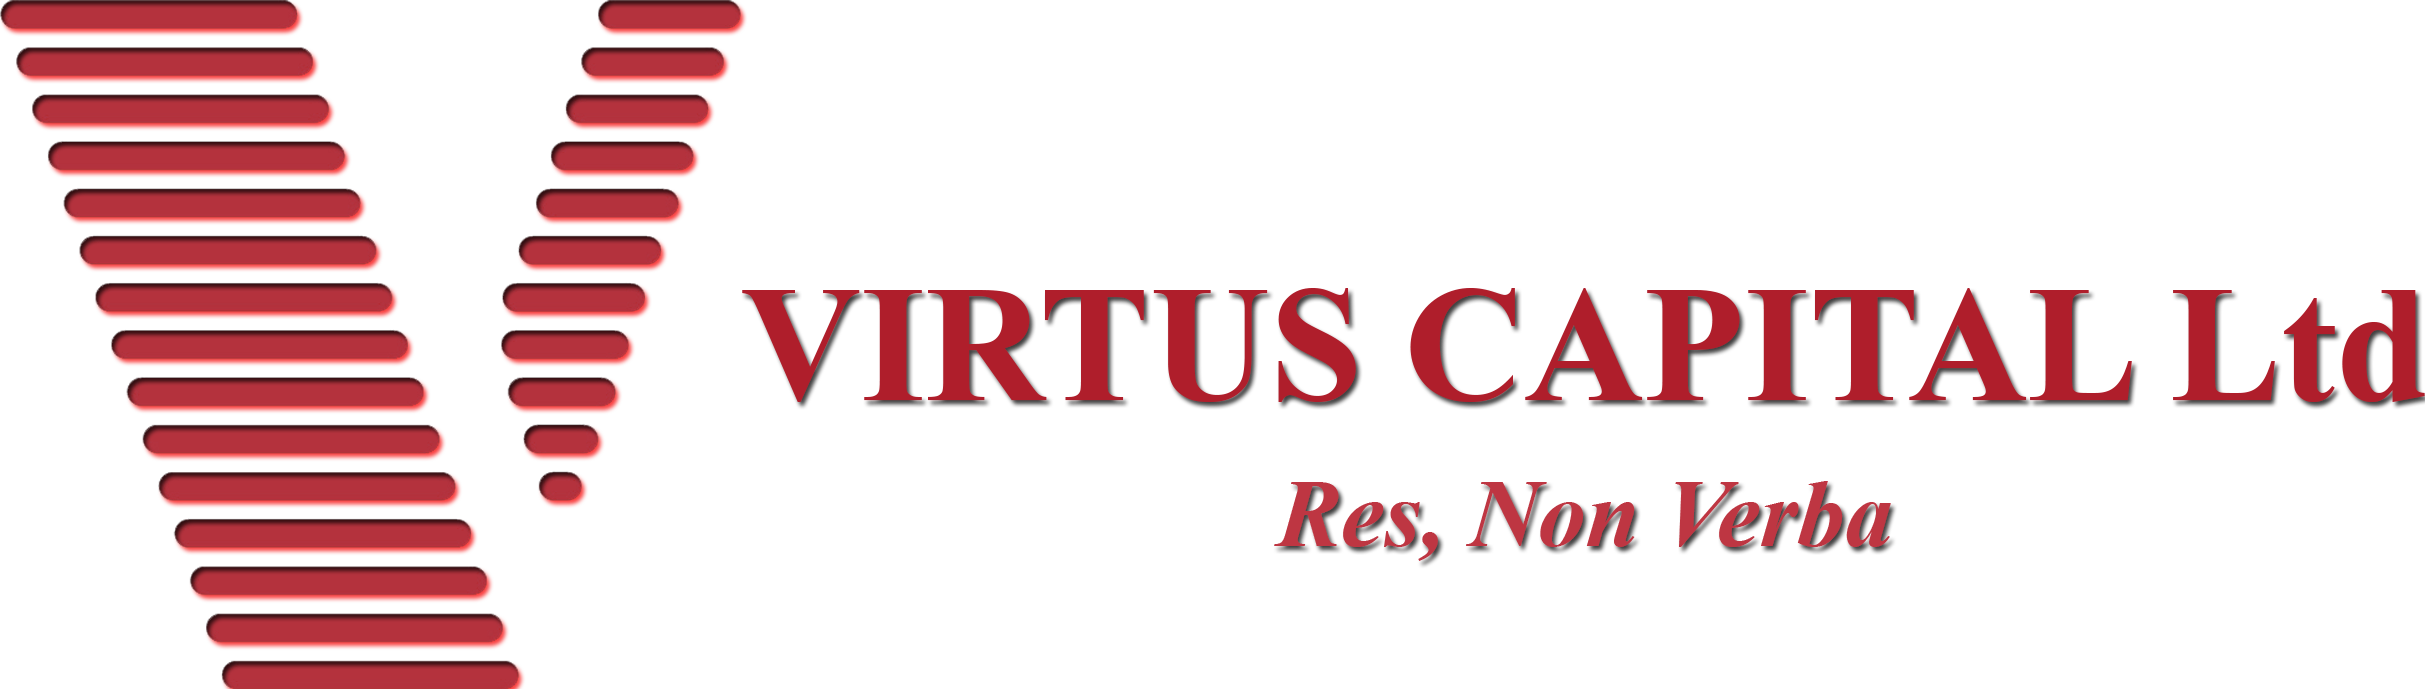 Virtus Capital